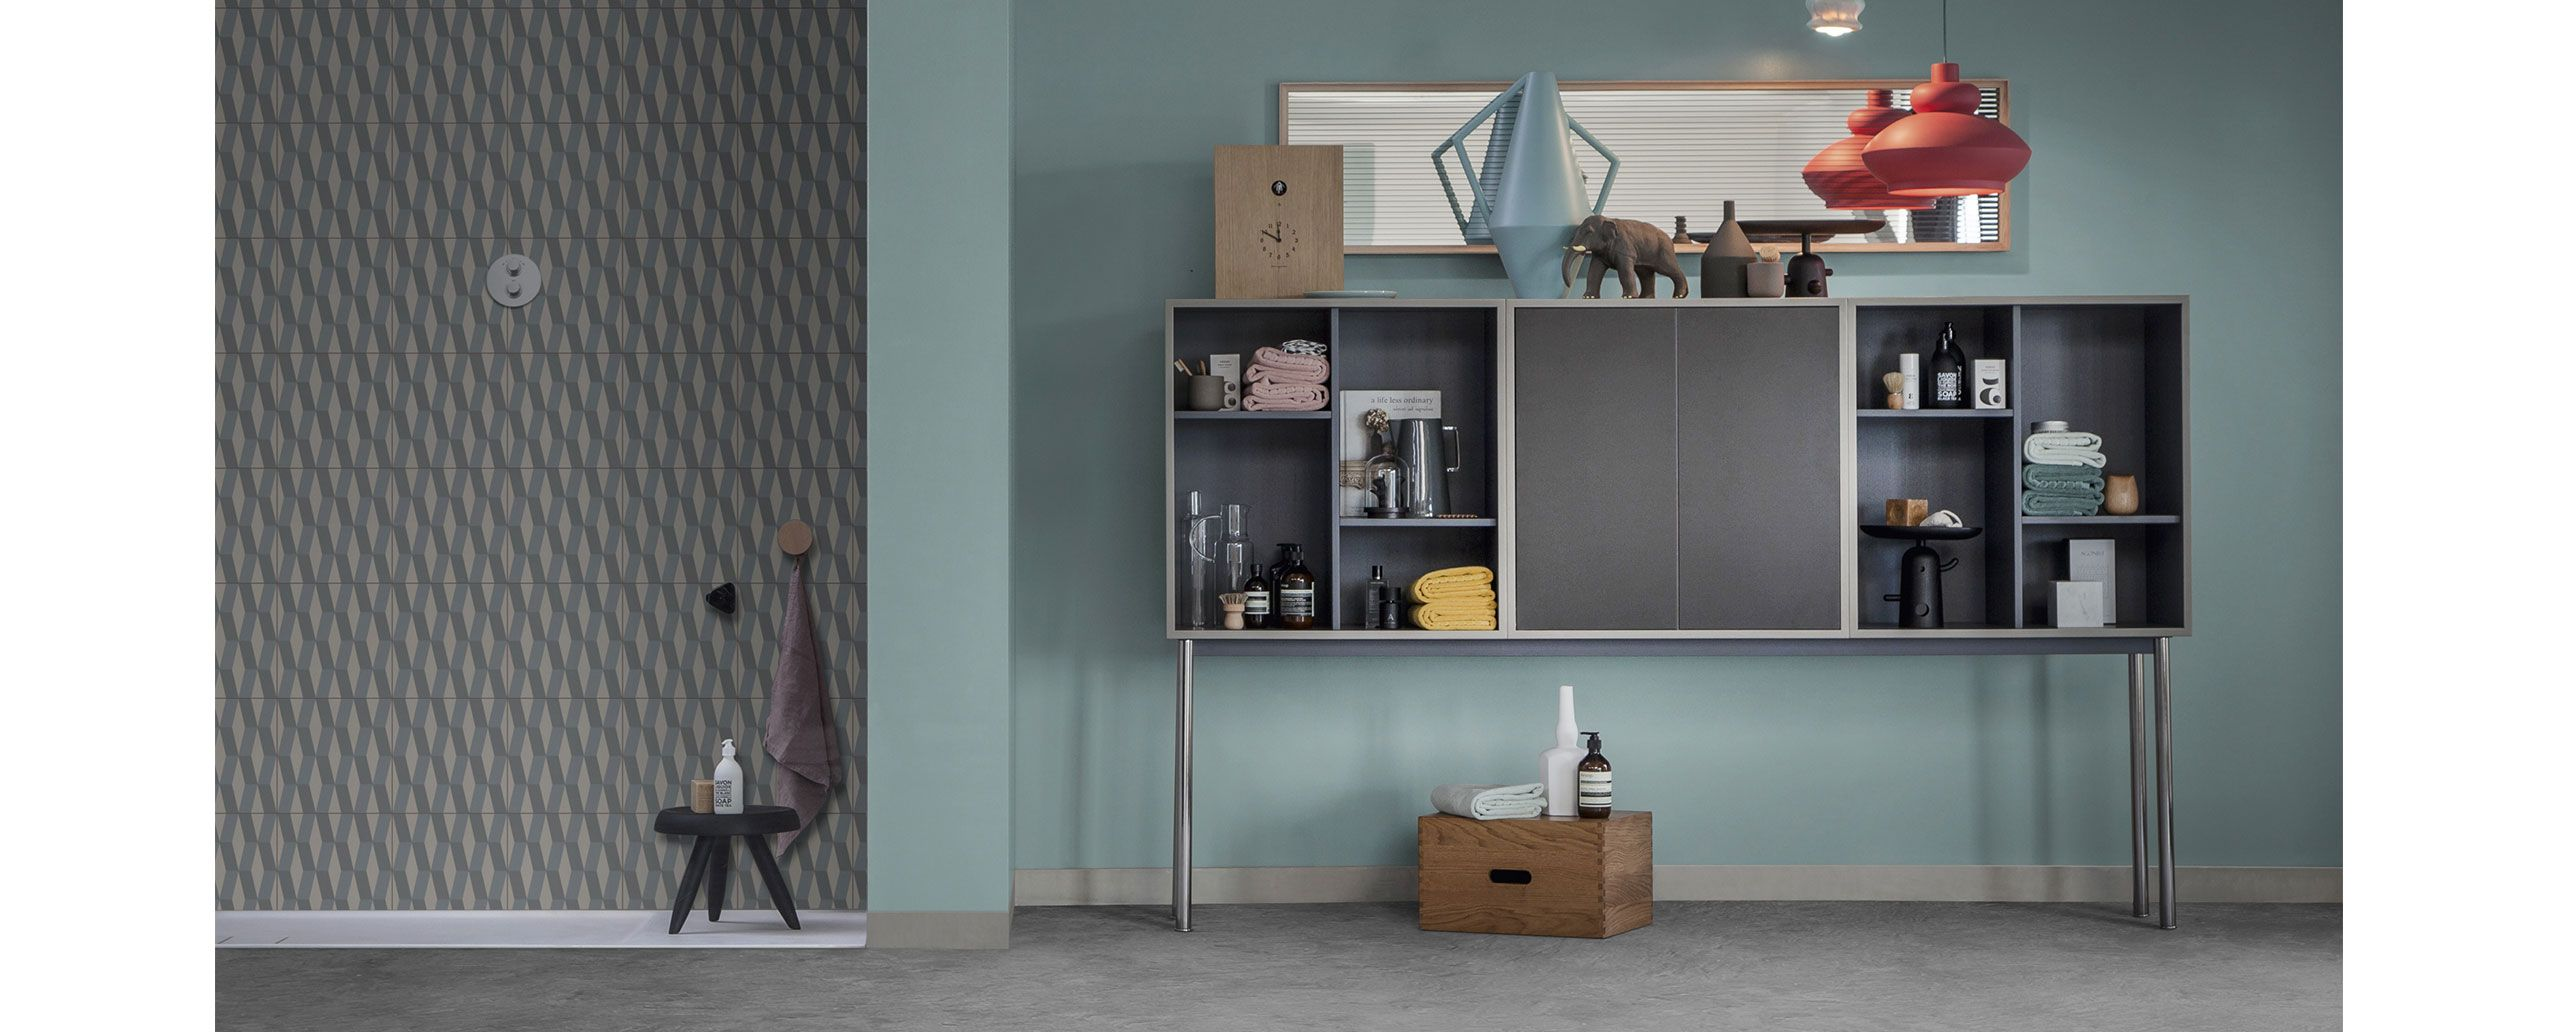 d270f4b8338b0301c3e162a9c6d78898 Incroyable De Table Basse Le Corbusier Concept